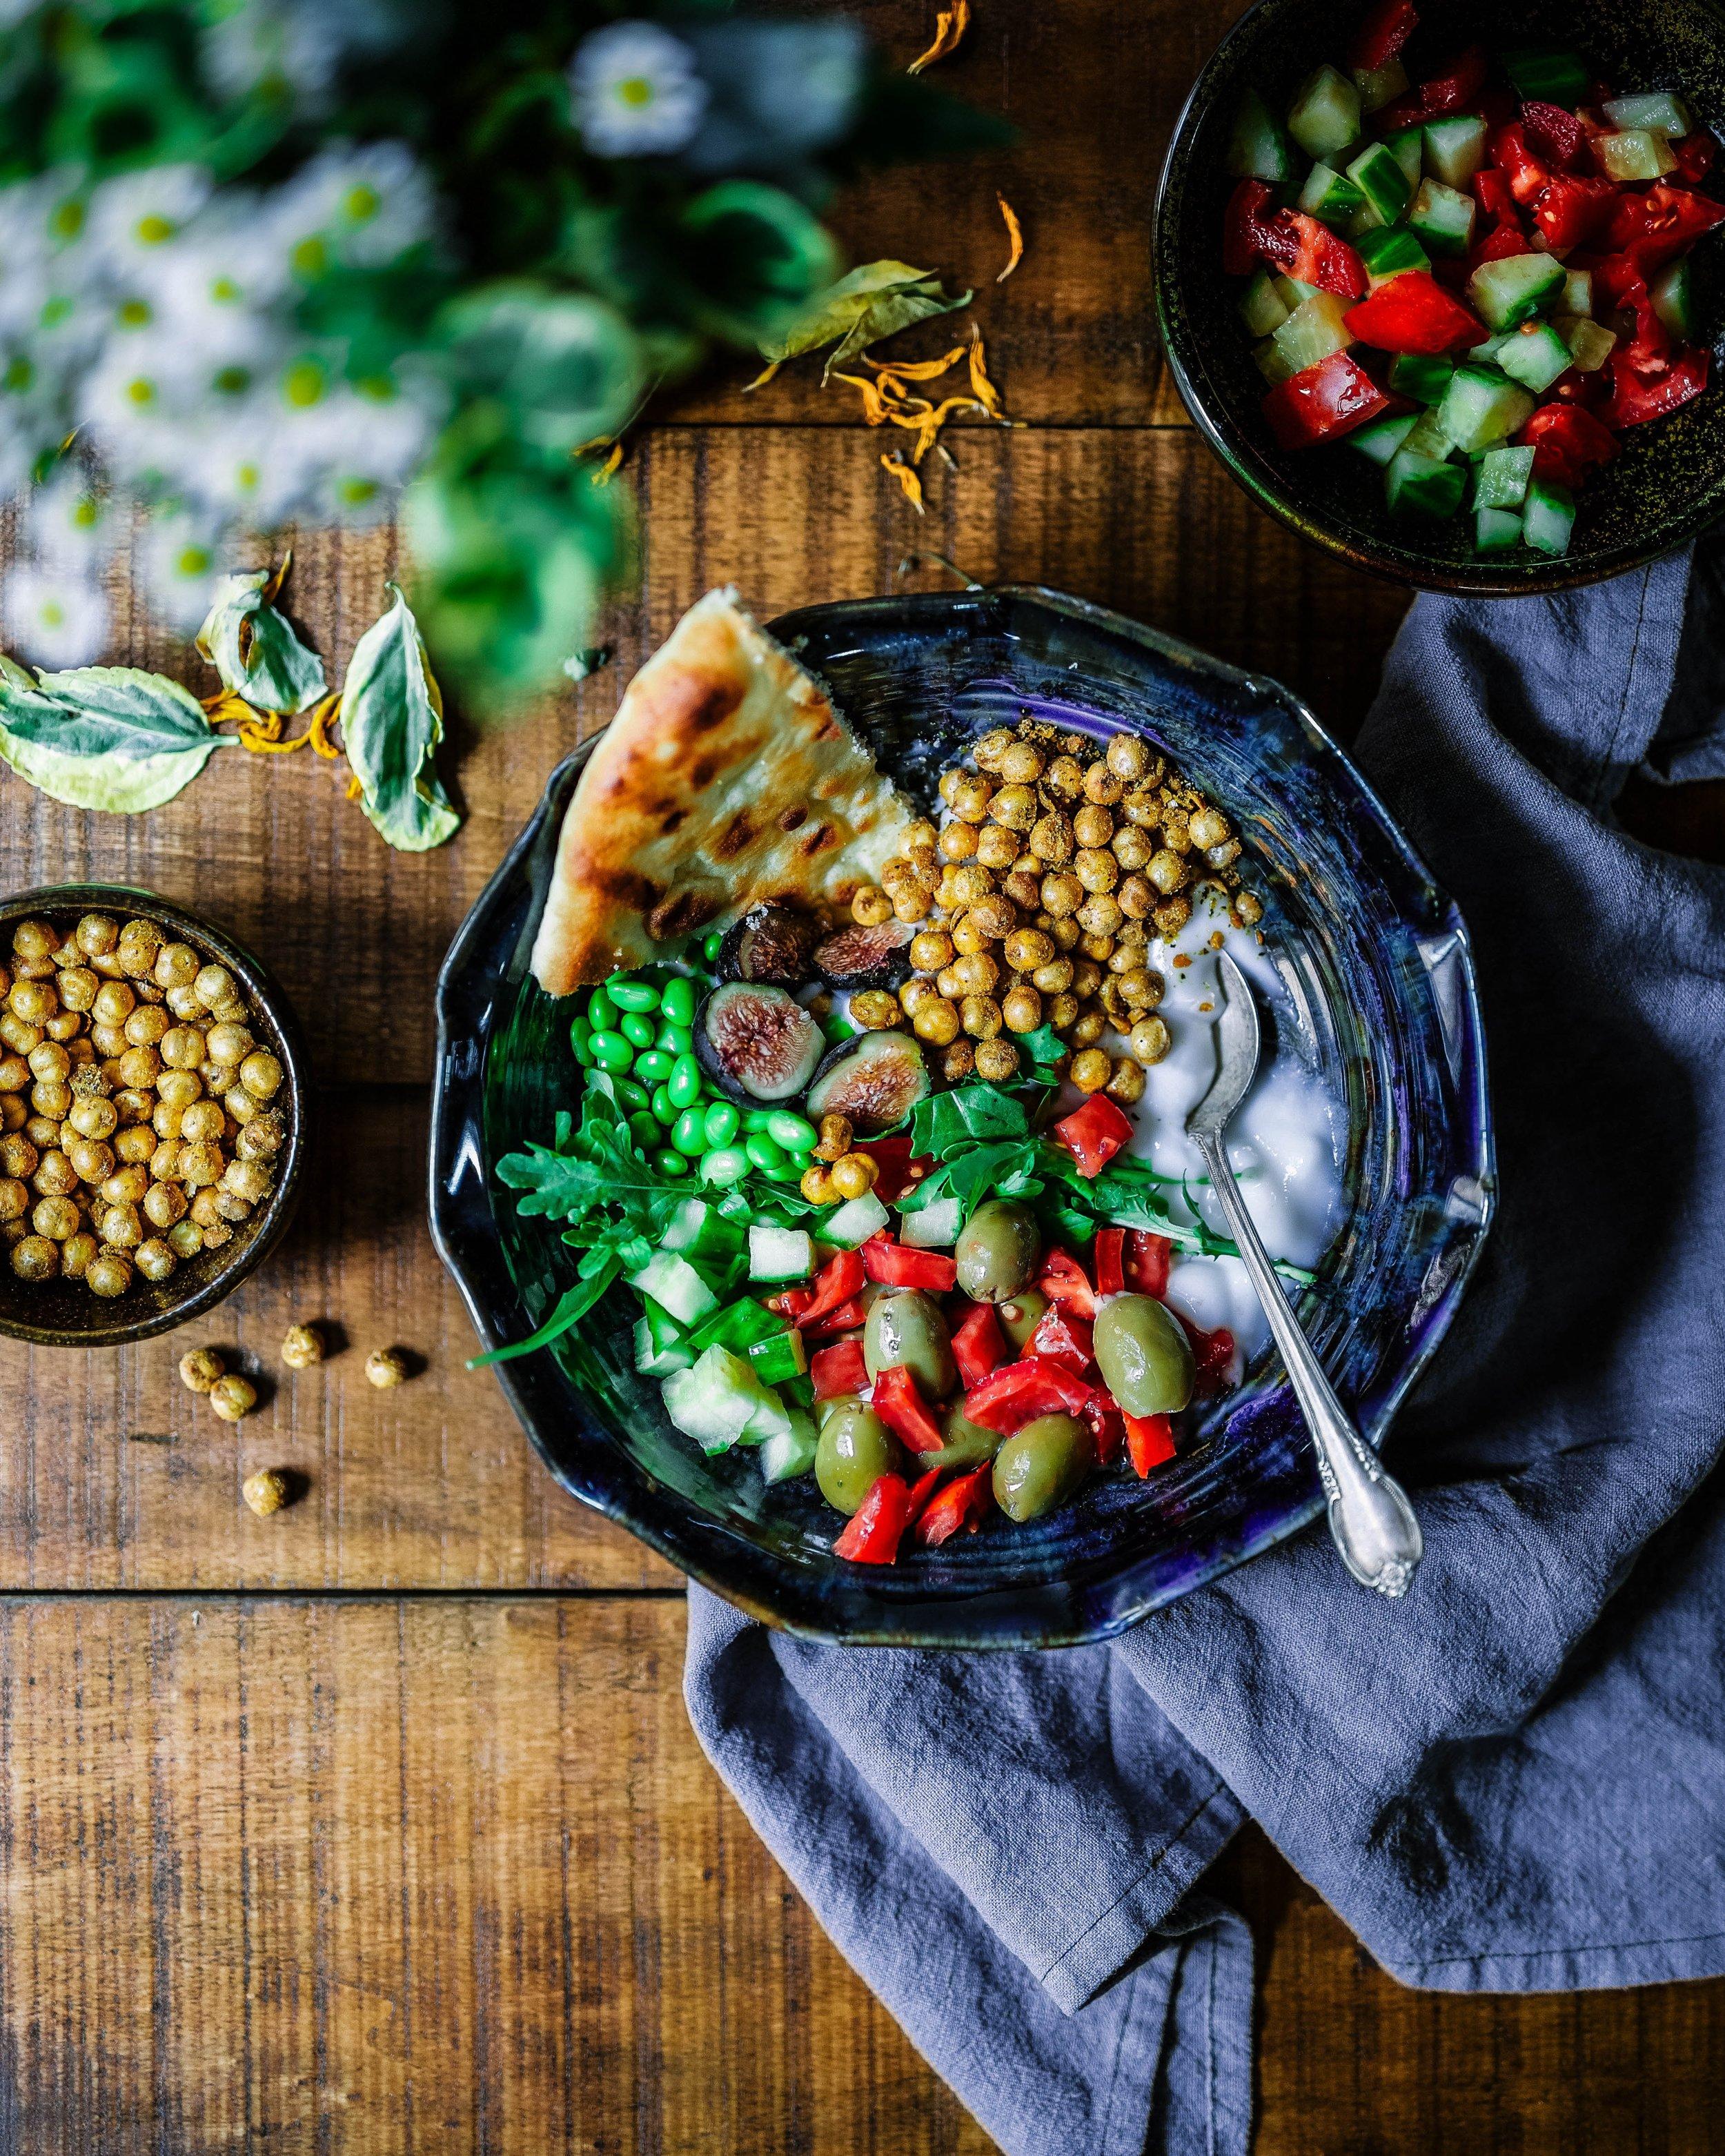 vegan-diet-paleo-pegan-food-trend-2019